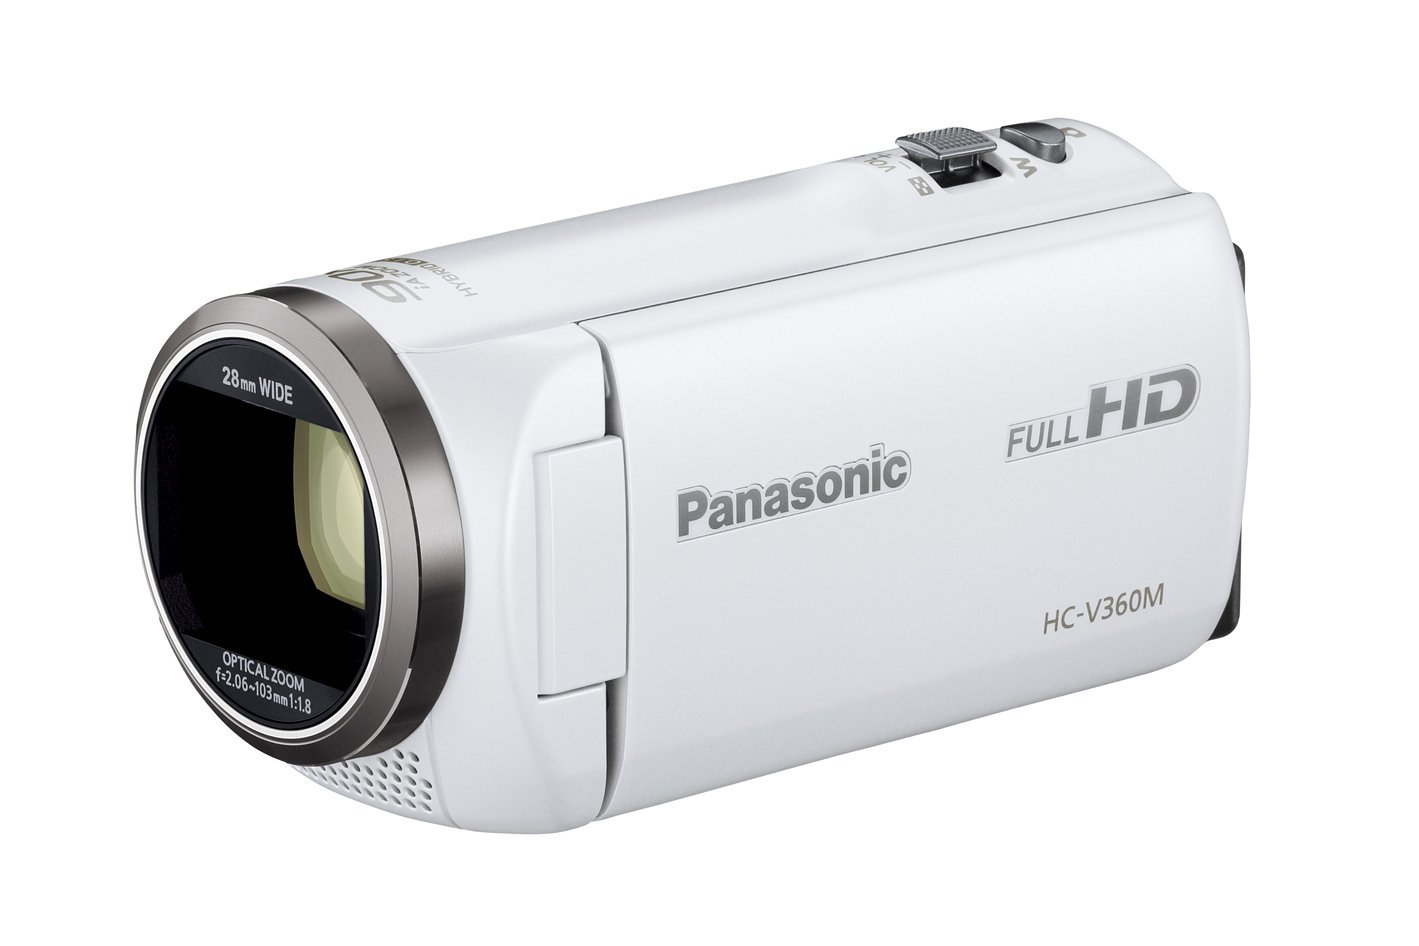 Panasonic HDビデオカメラ V360Mの画像